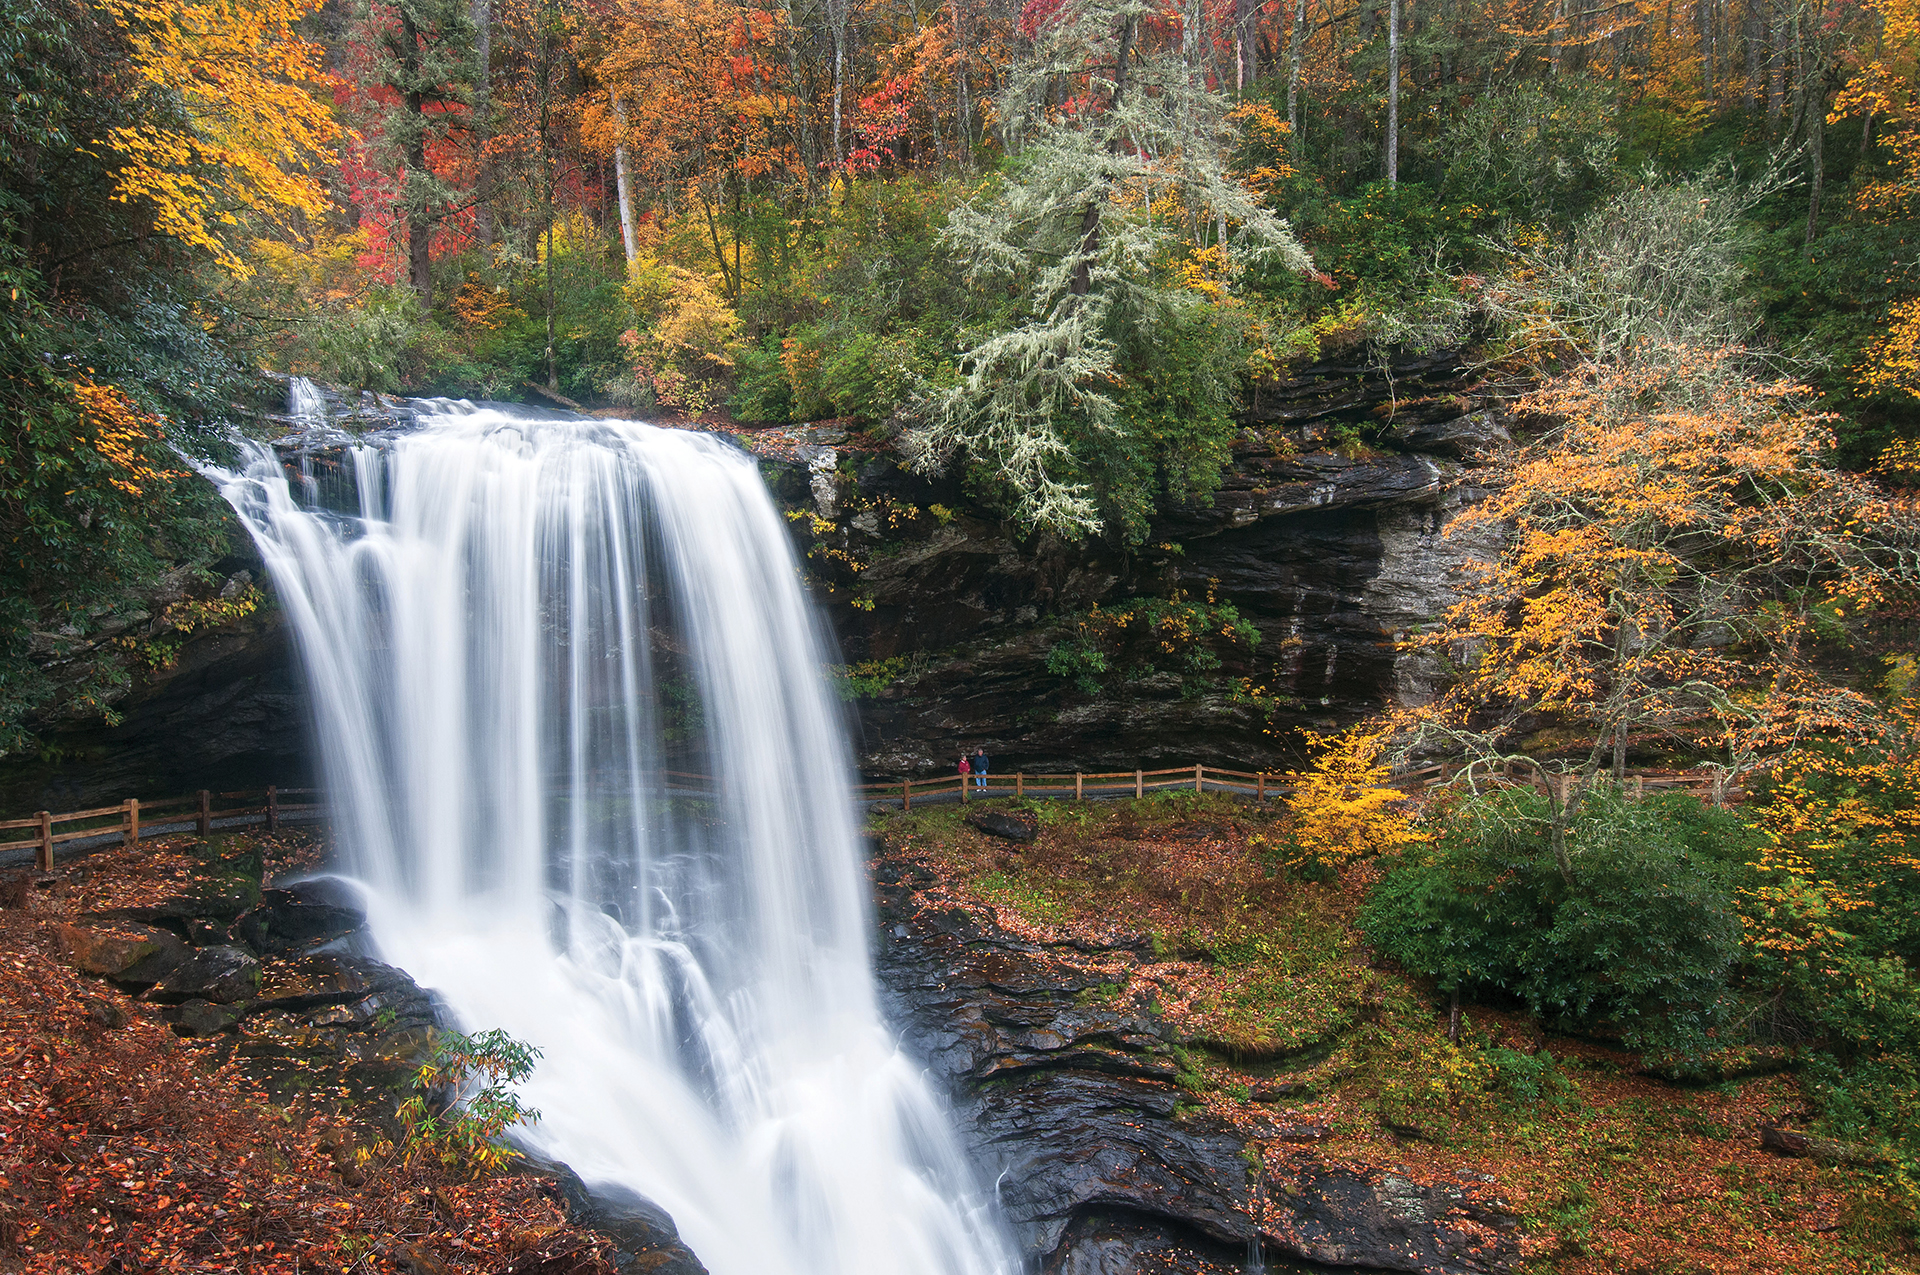 Dry Falls by Charles Johnson